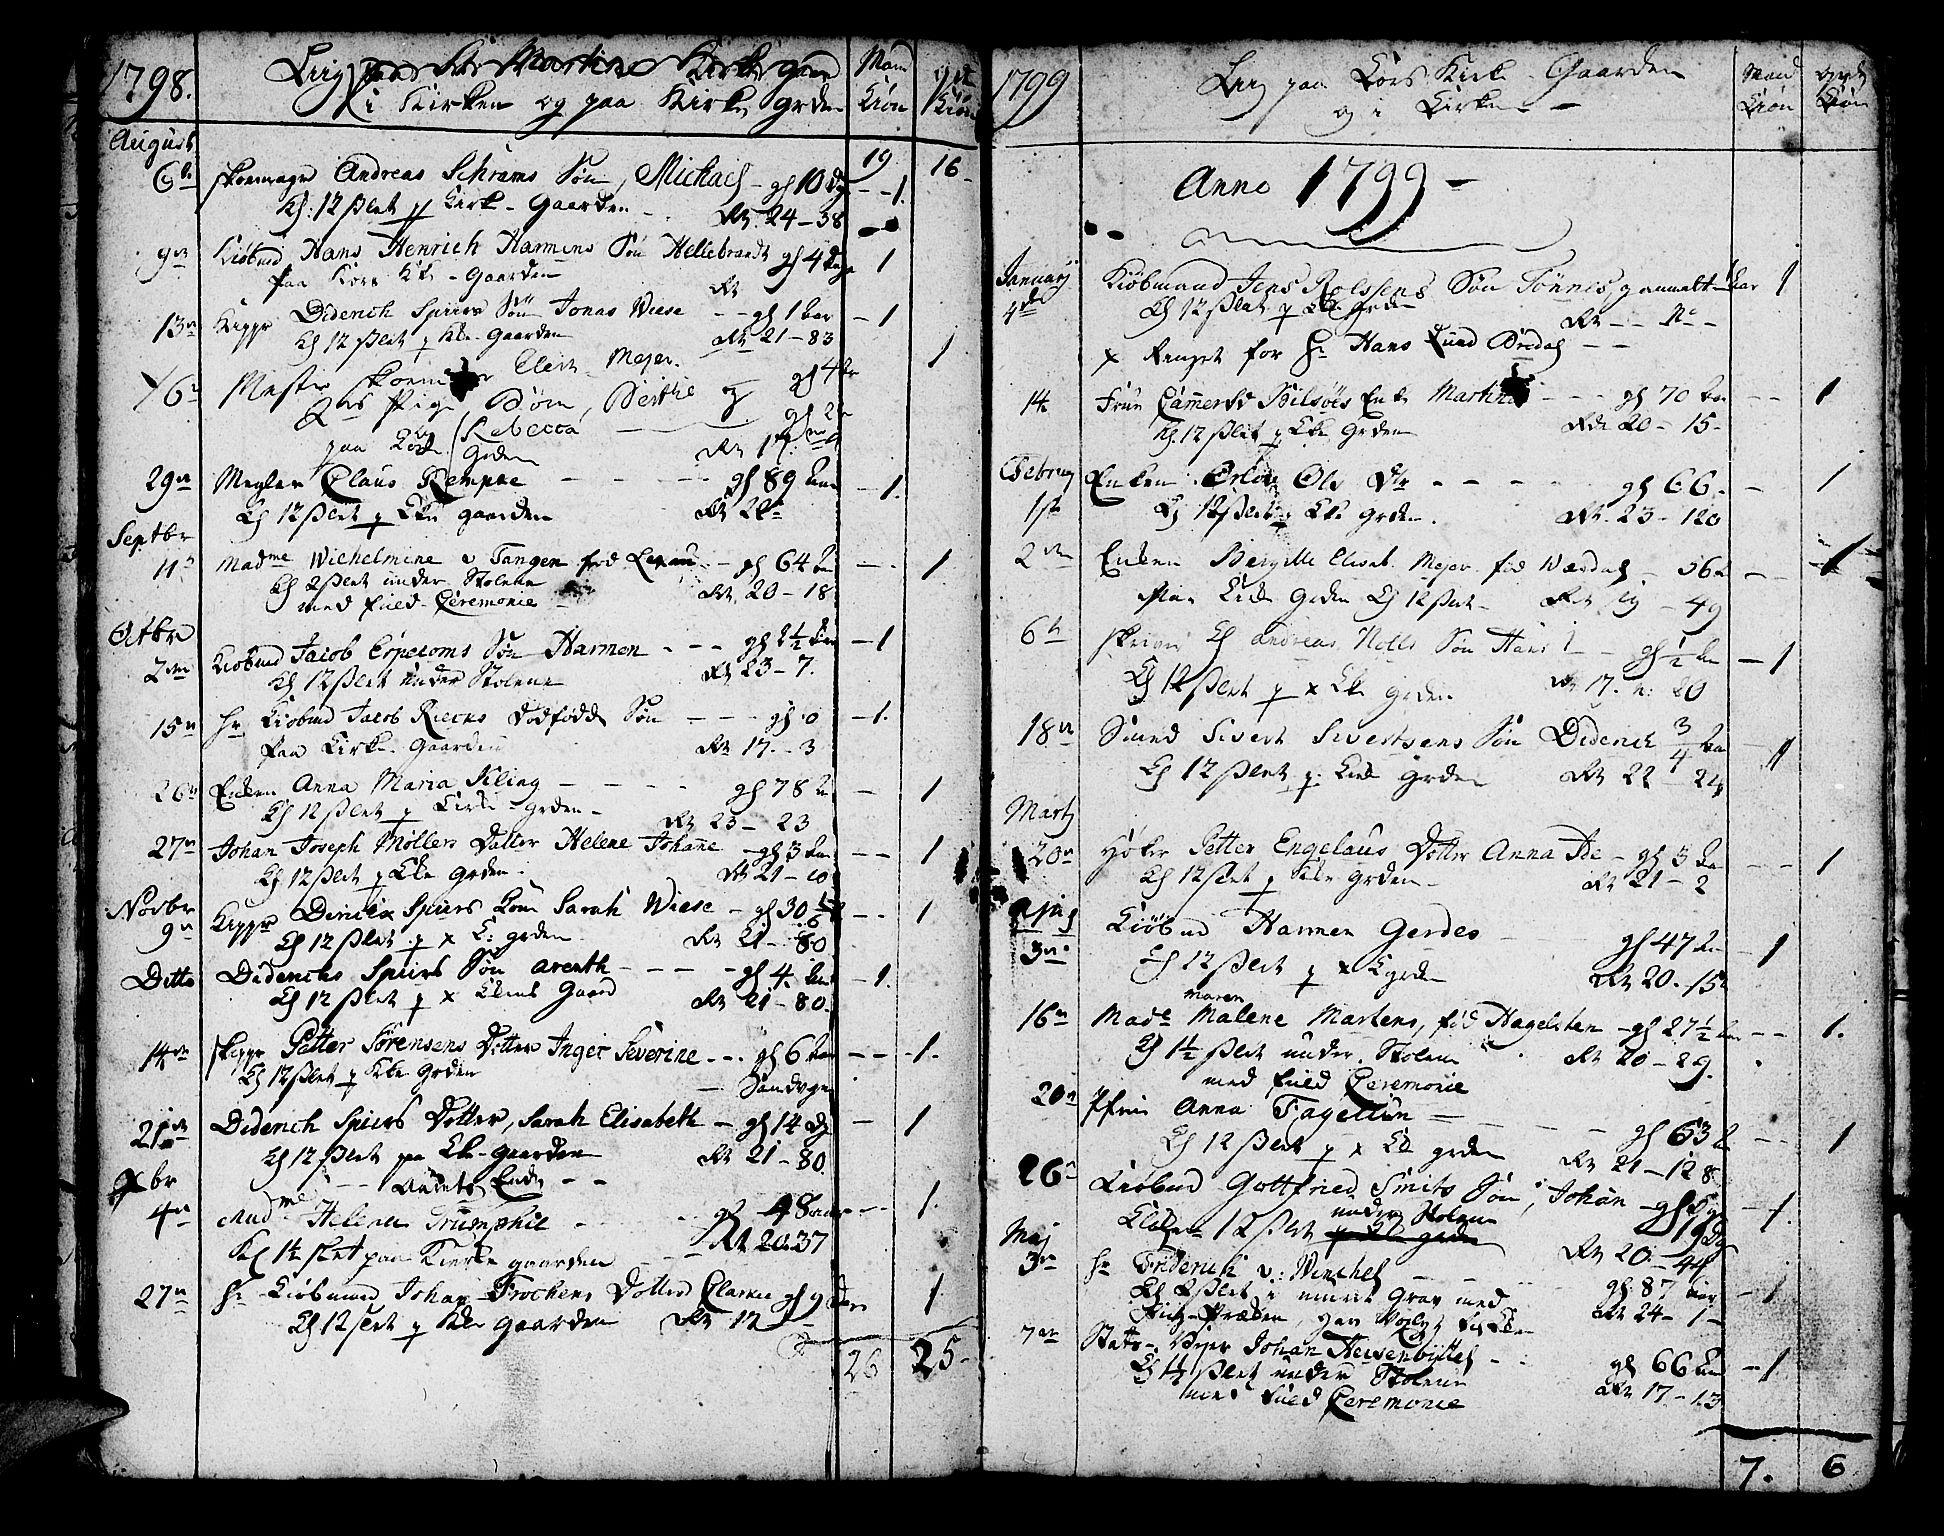 SAB, Korskirken Sokneprestembete, H/Haa/L0012: Ministerialbok nr. A 12, 1786-1832, s. 159